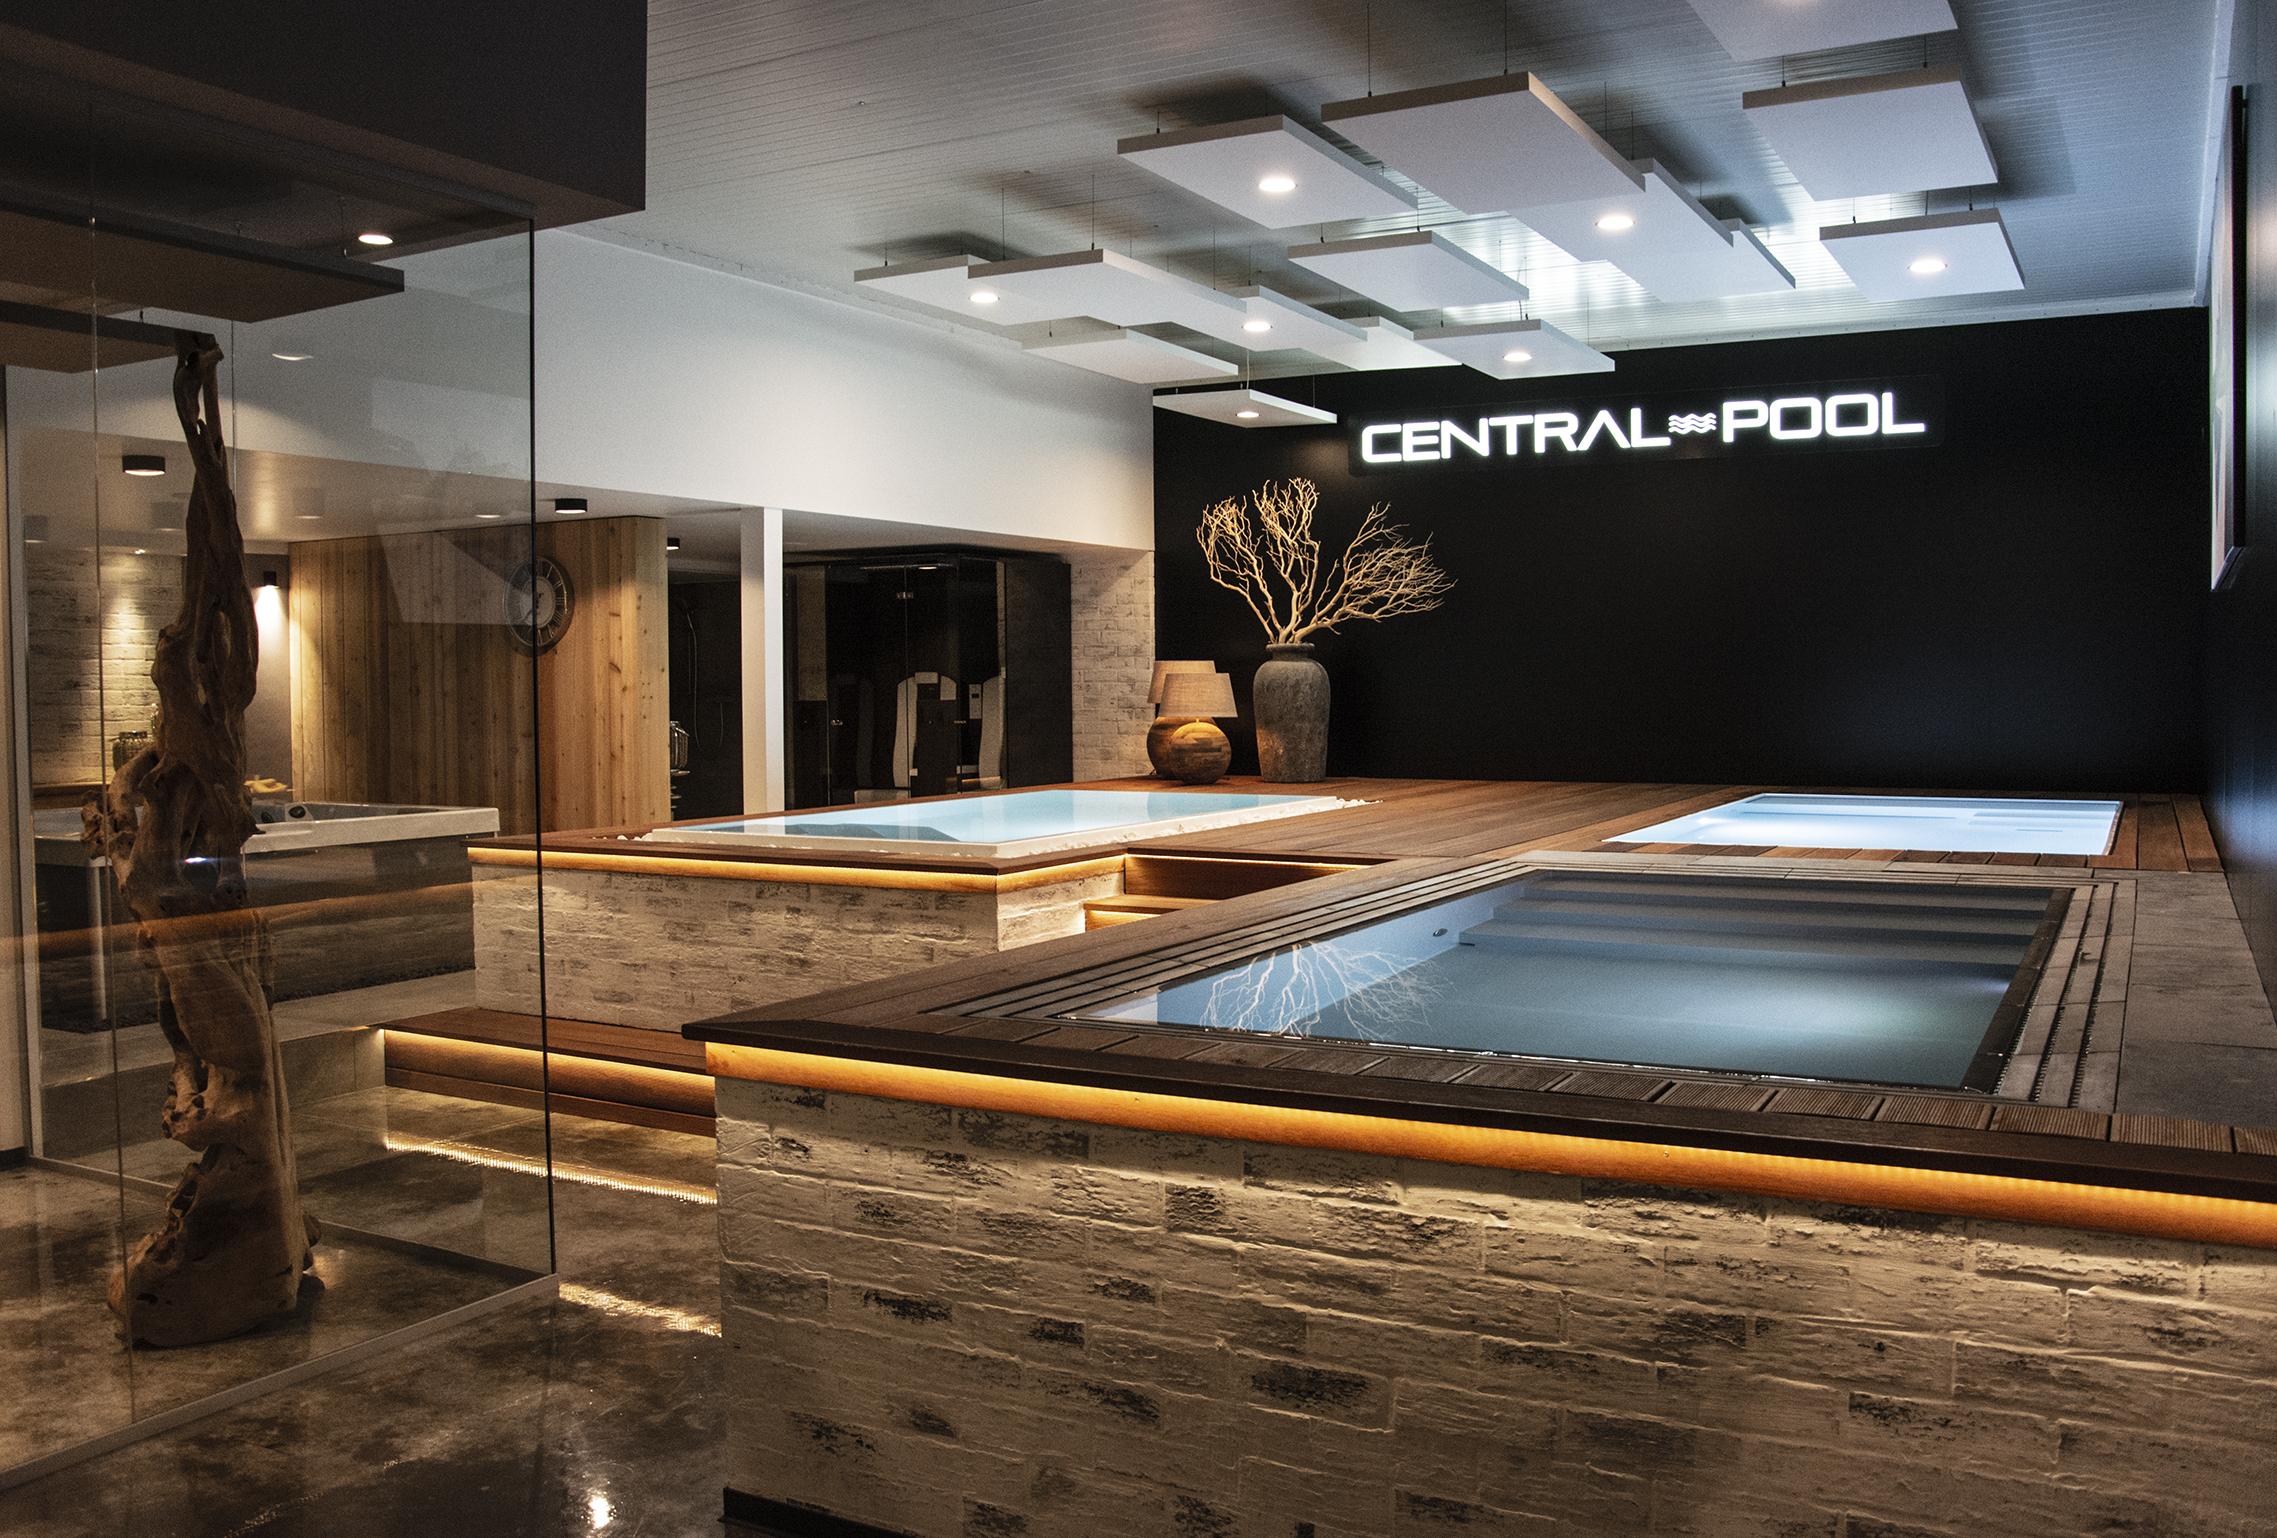 Central-pool – rekonstrukce showroomu – Hradec Králové